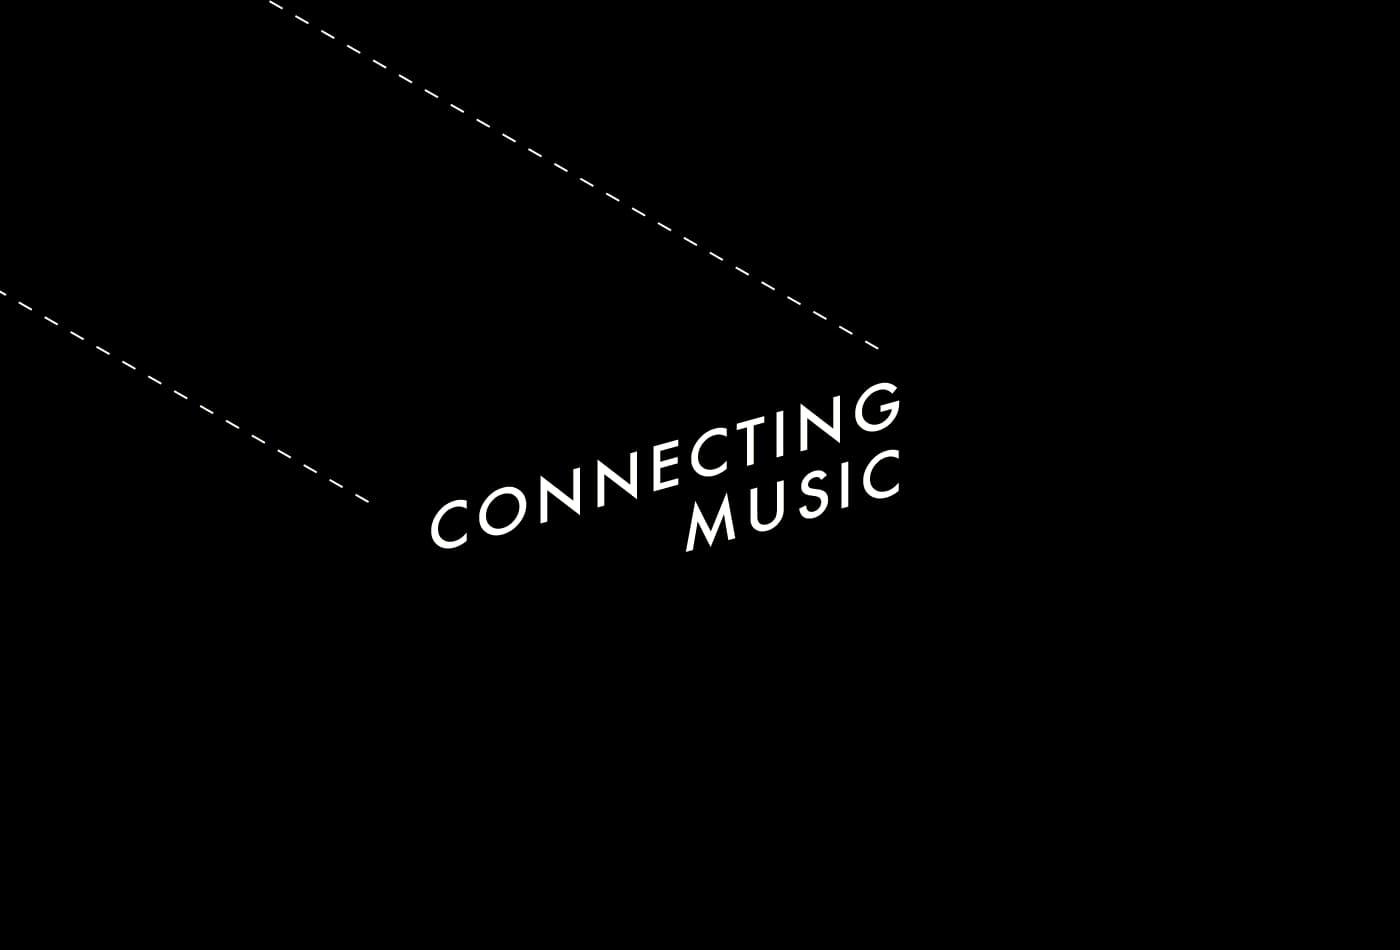 AudioPhilia Tagline - Connecting Music